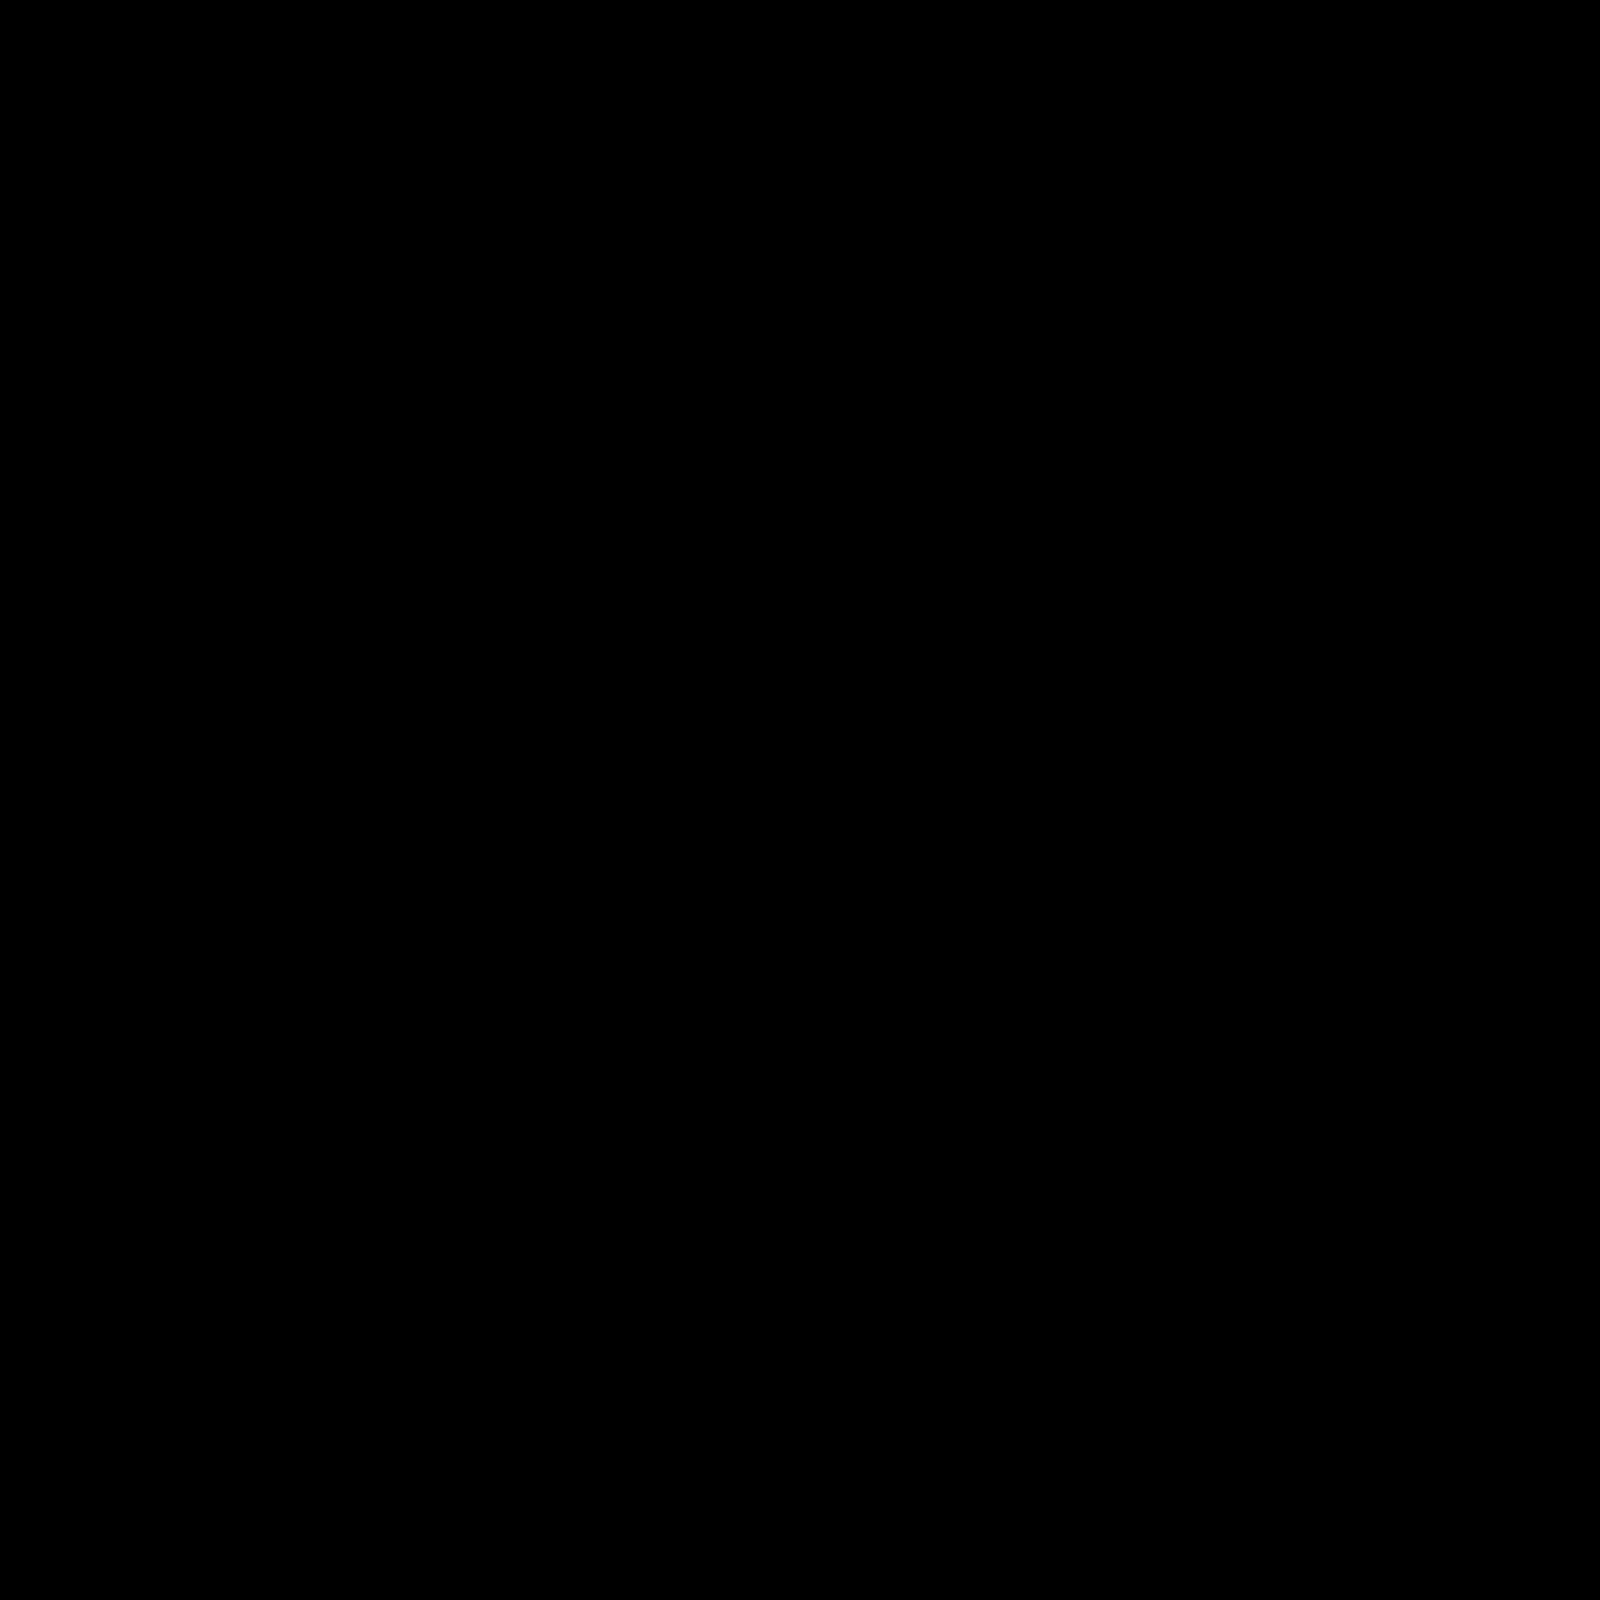 1600x1600 Google Mobile Icon